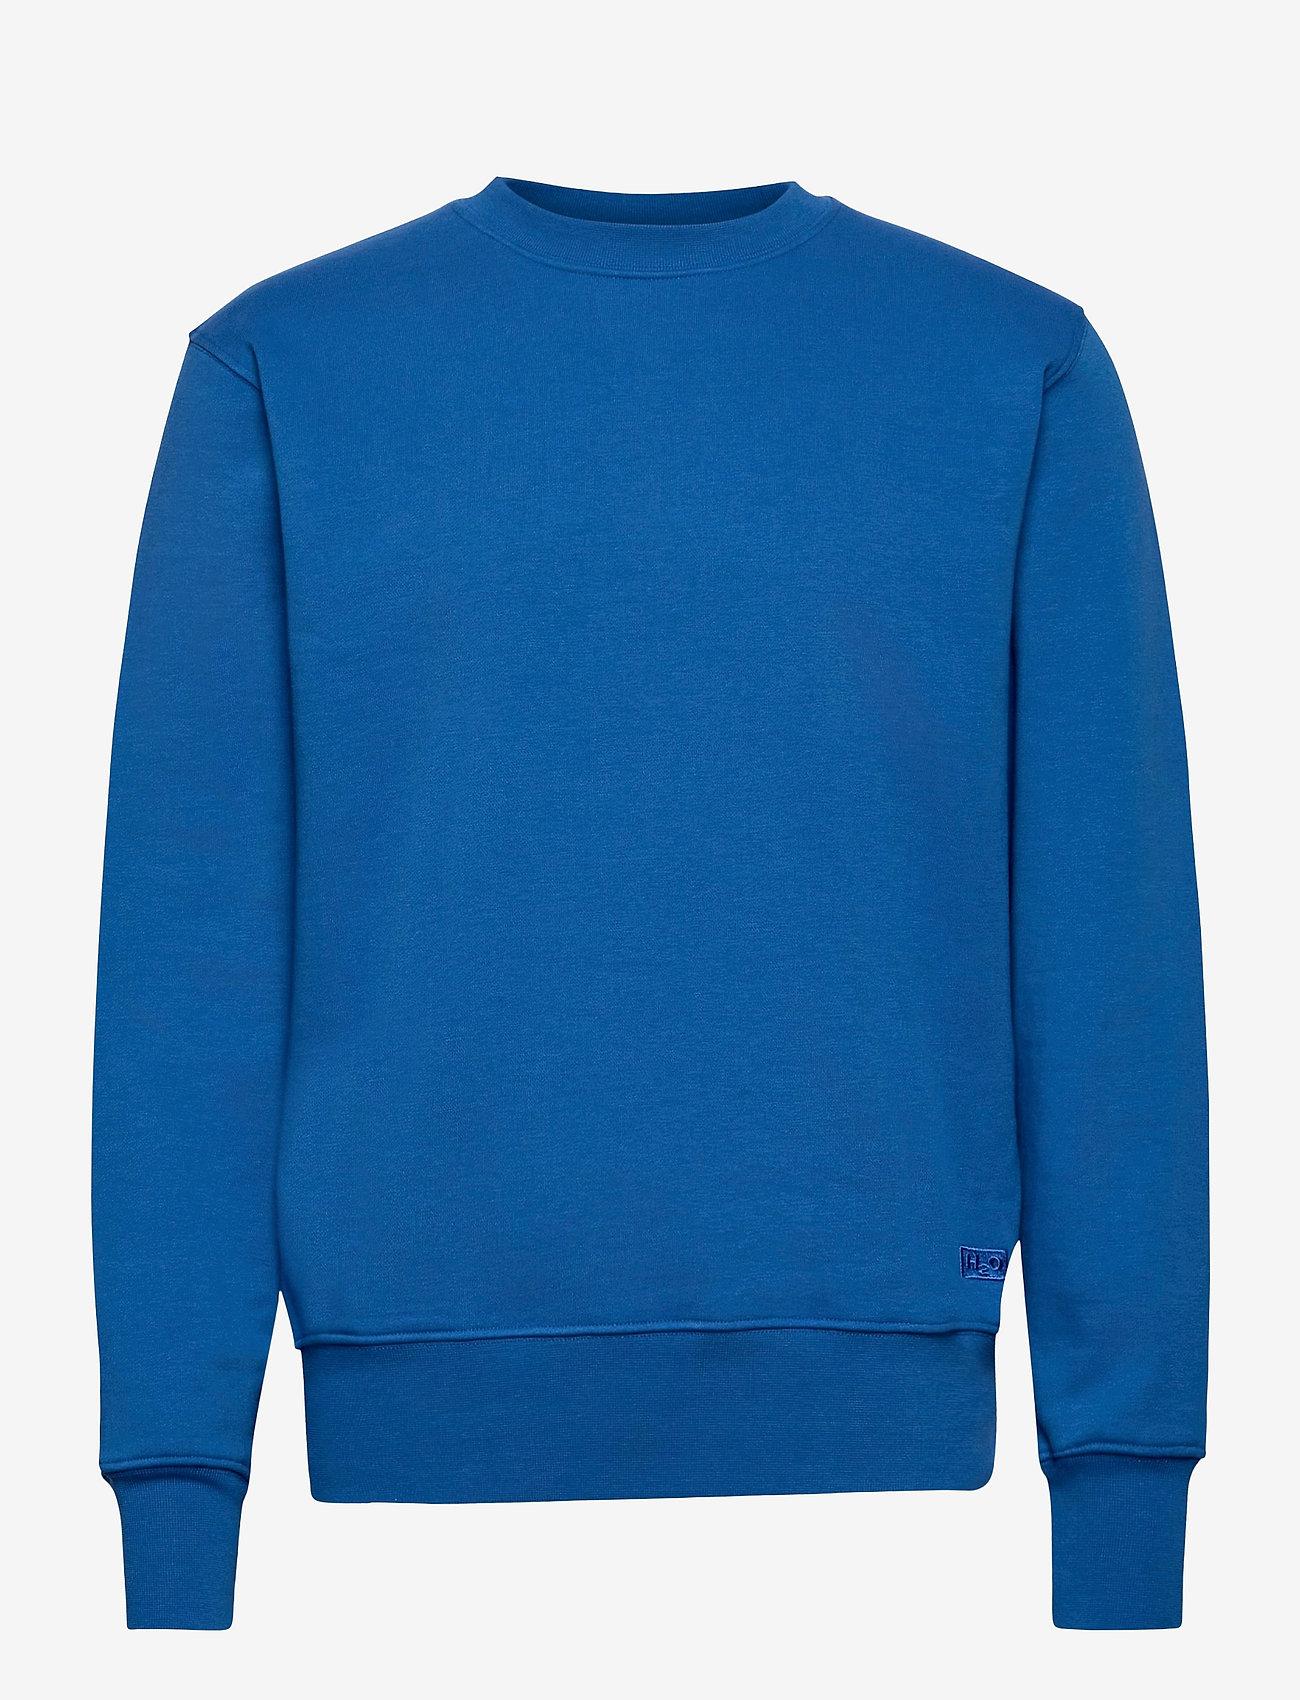 H2O - Couch Sweat O'neck - basic sweatshirts - cobalt blue - 0